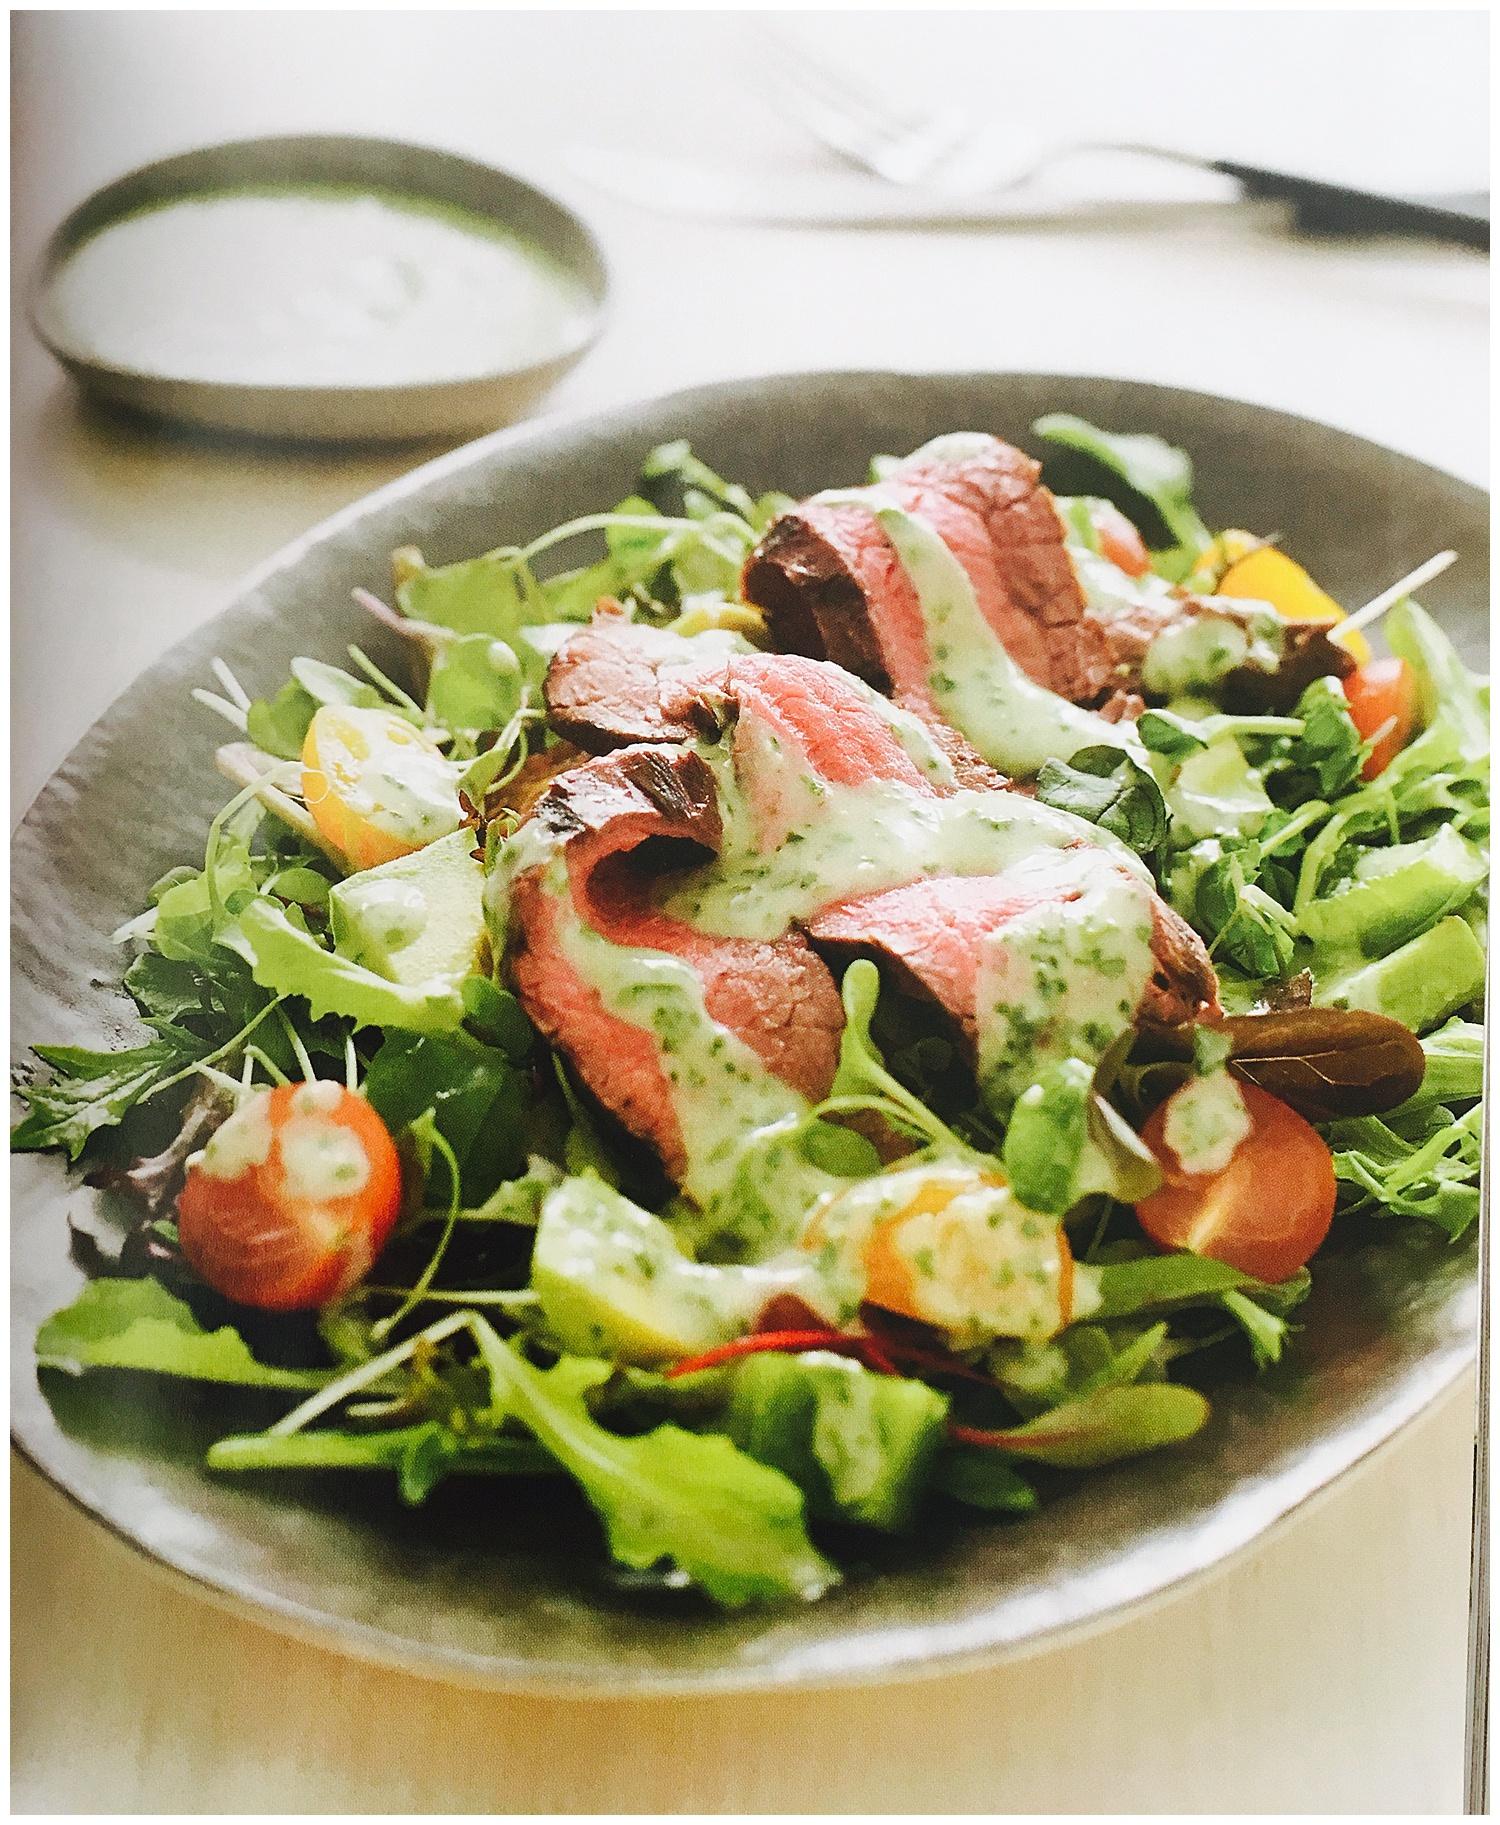 Steak salad with cilantro-lime-homemade mayo